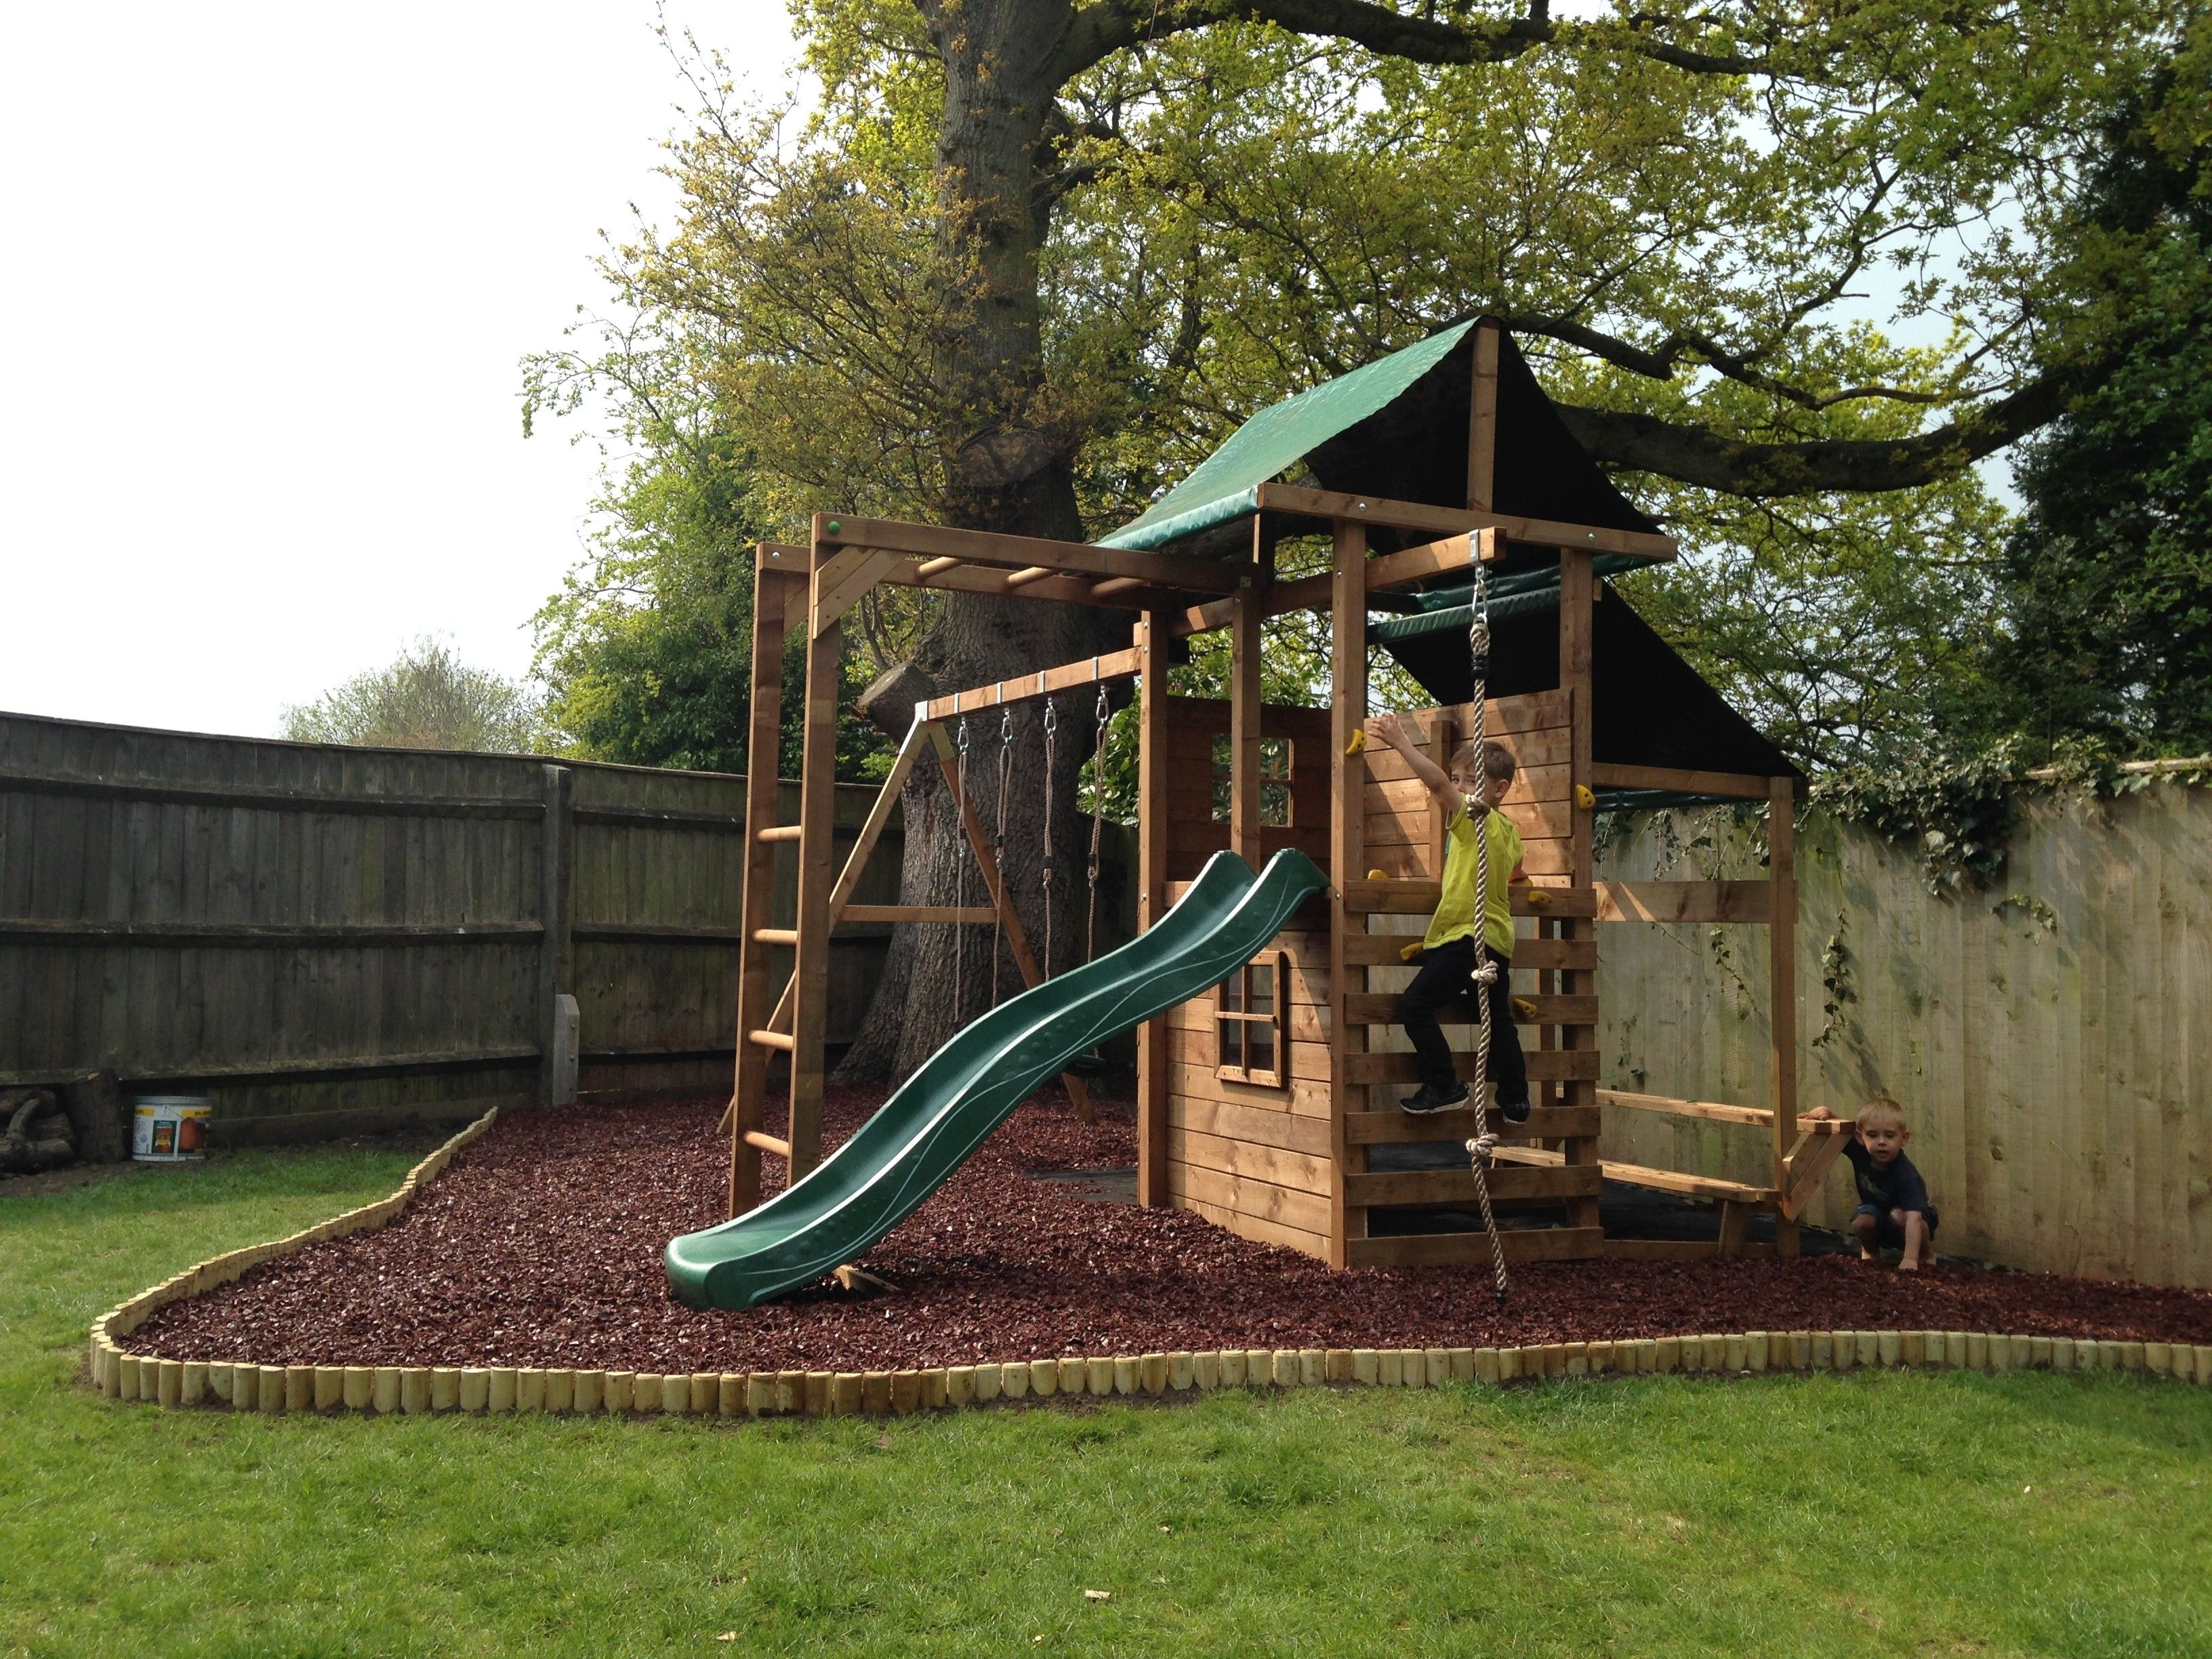 Customer reviews manorfort stronghold dunster house